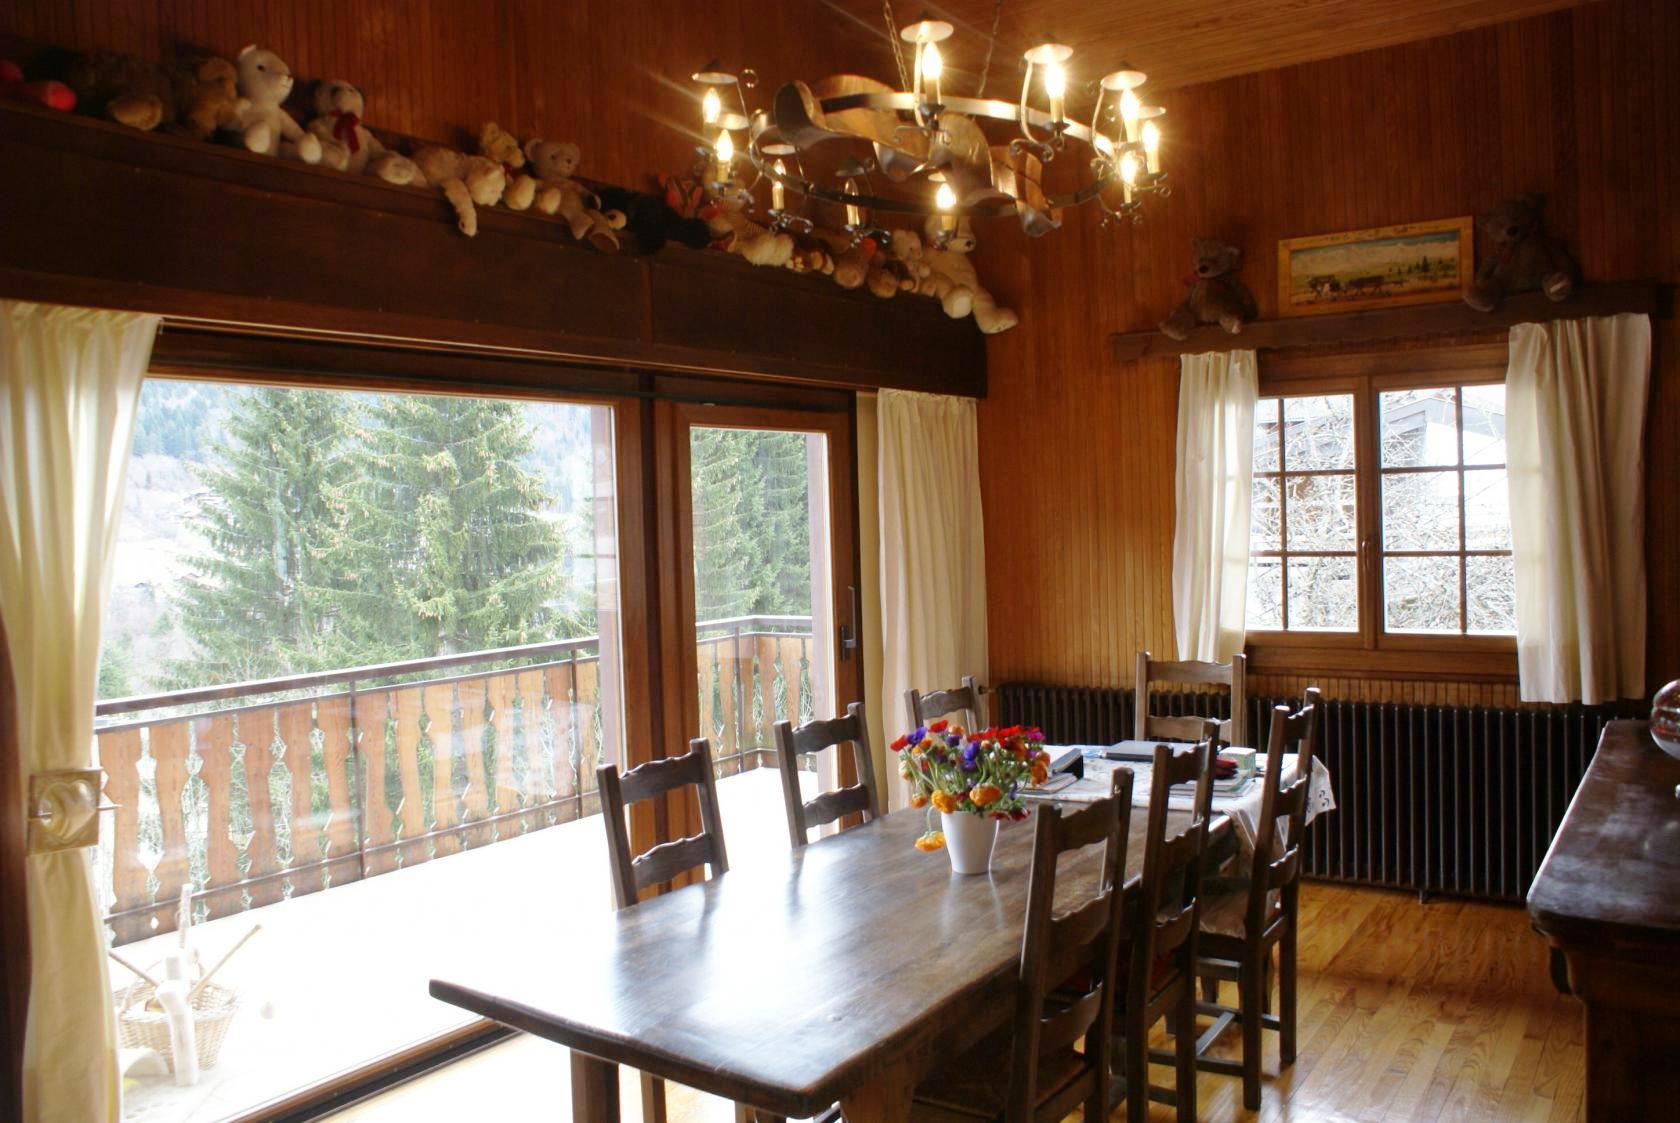 Morzine chalet - sunny dining room